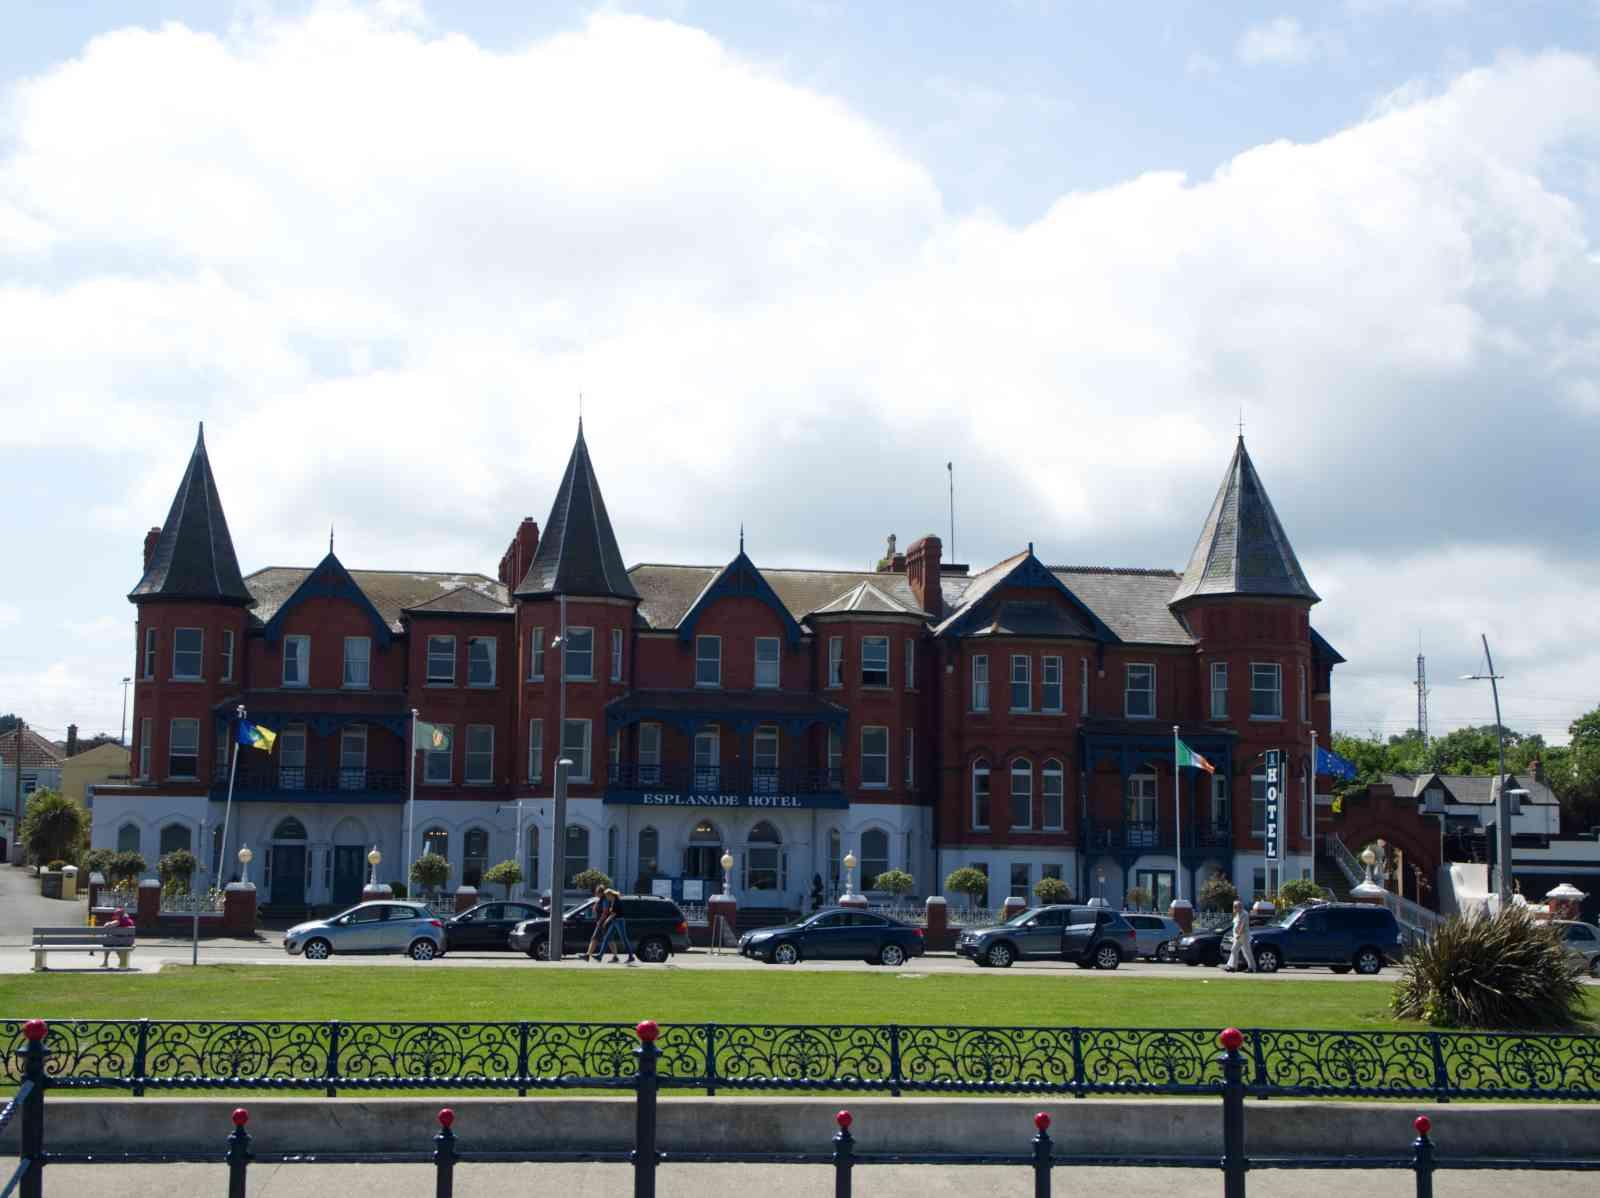 Irland - Esplanade Hotel, Bray